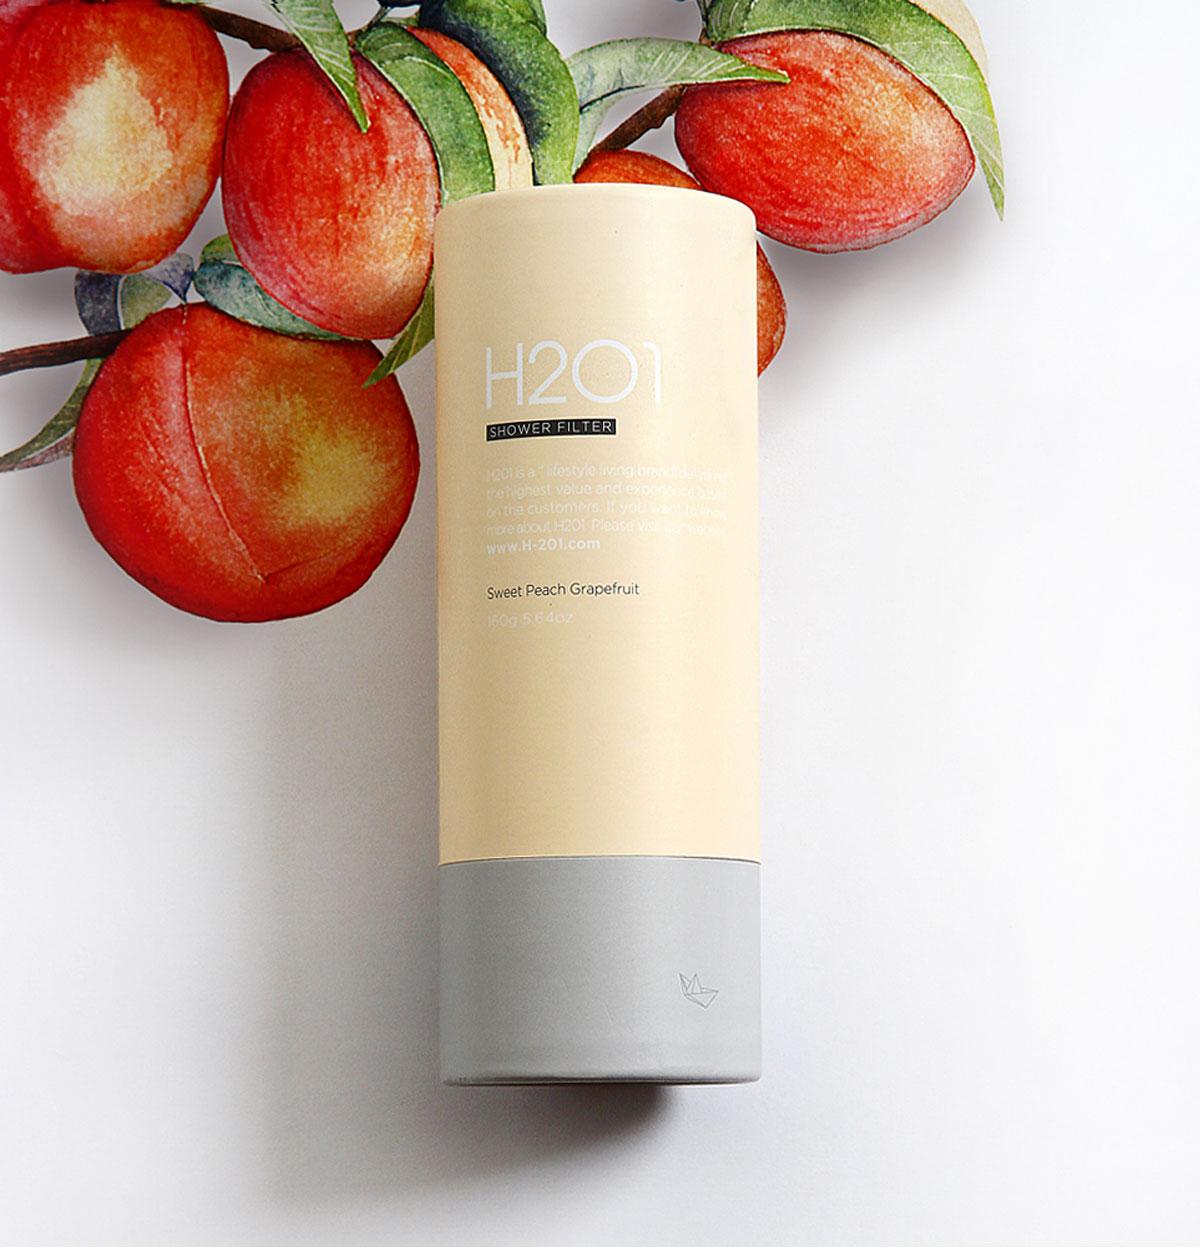 H2O1 Vitamin Shower Filter วิตามินสำหรับอาบน้ำ กลิ่นสวีทพีชเกรปฟรุ๊ต